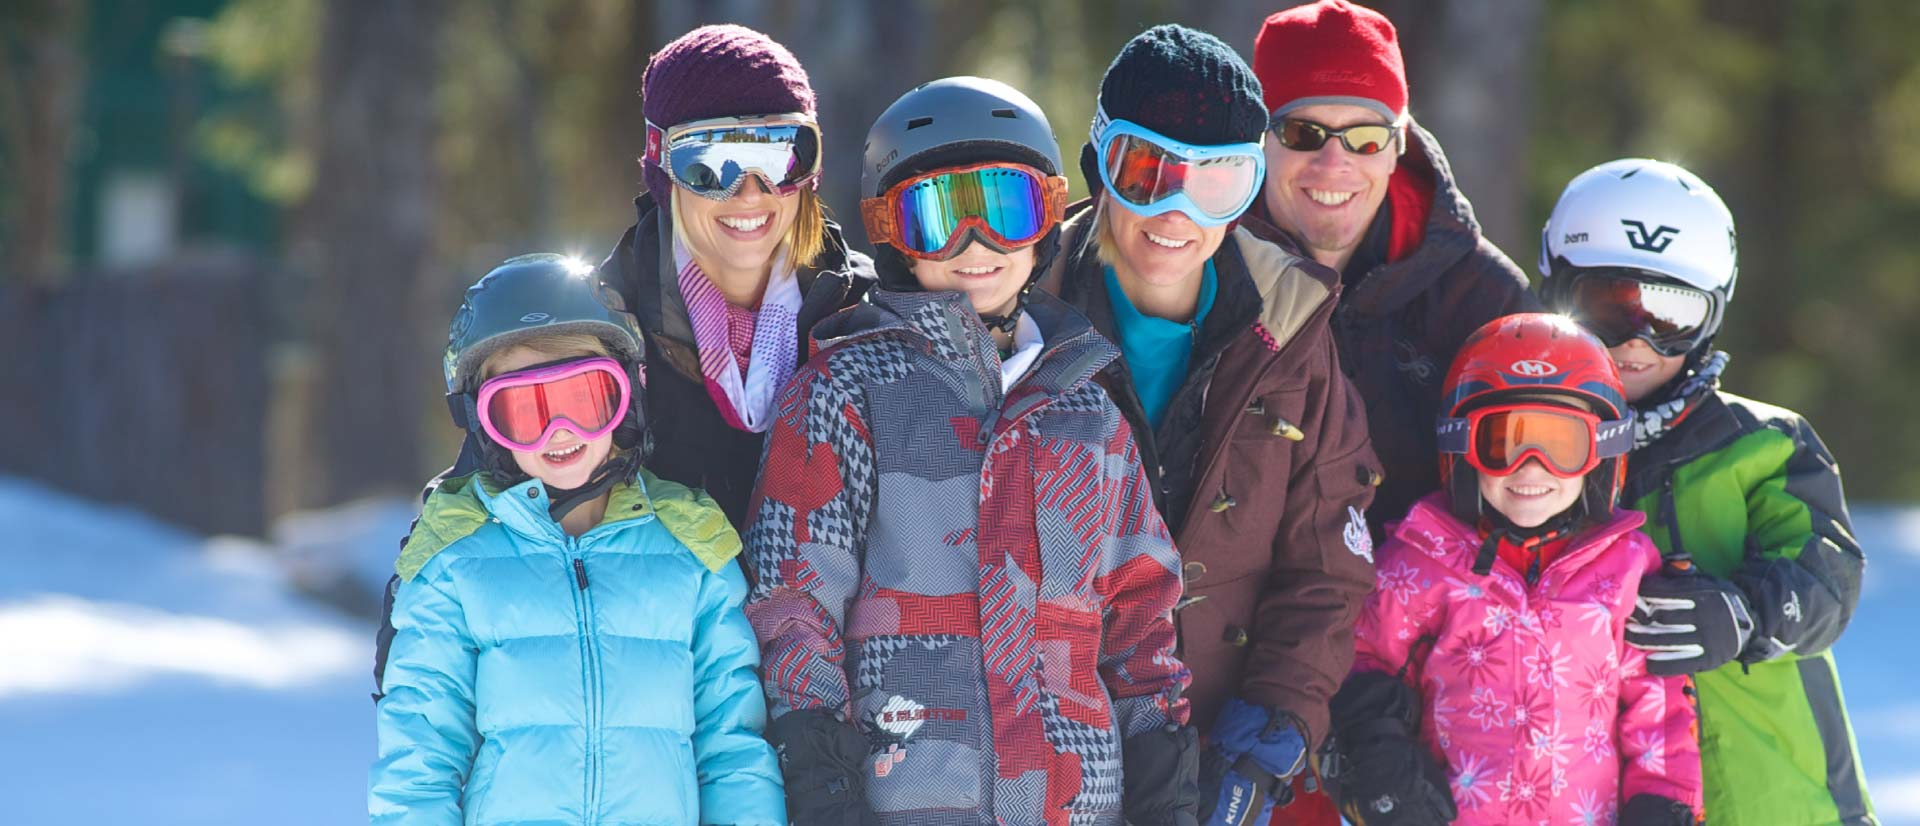 Dodge Ridge Sport Shop, Dodge Ridge Tech Shop, Ski, Snowboard, Apparel, Ski Repair, Snowboard Repair